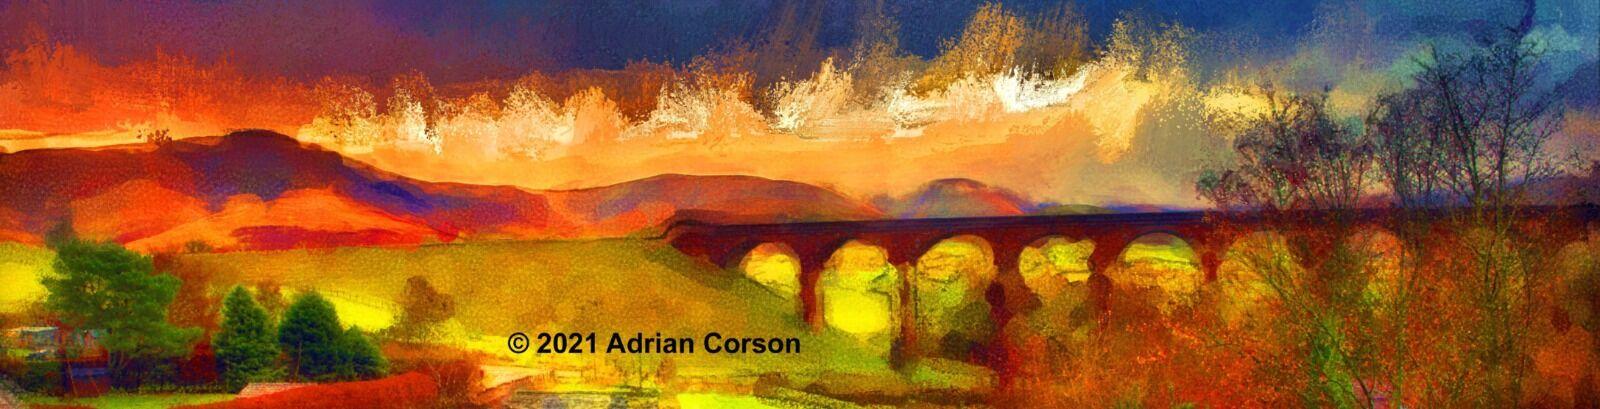 155-viaduct sunset